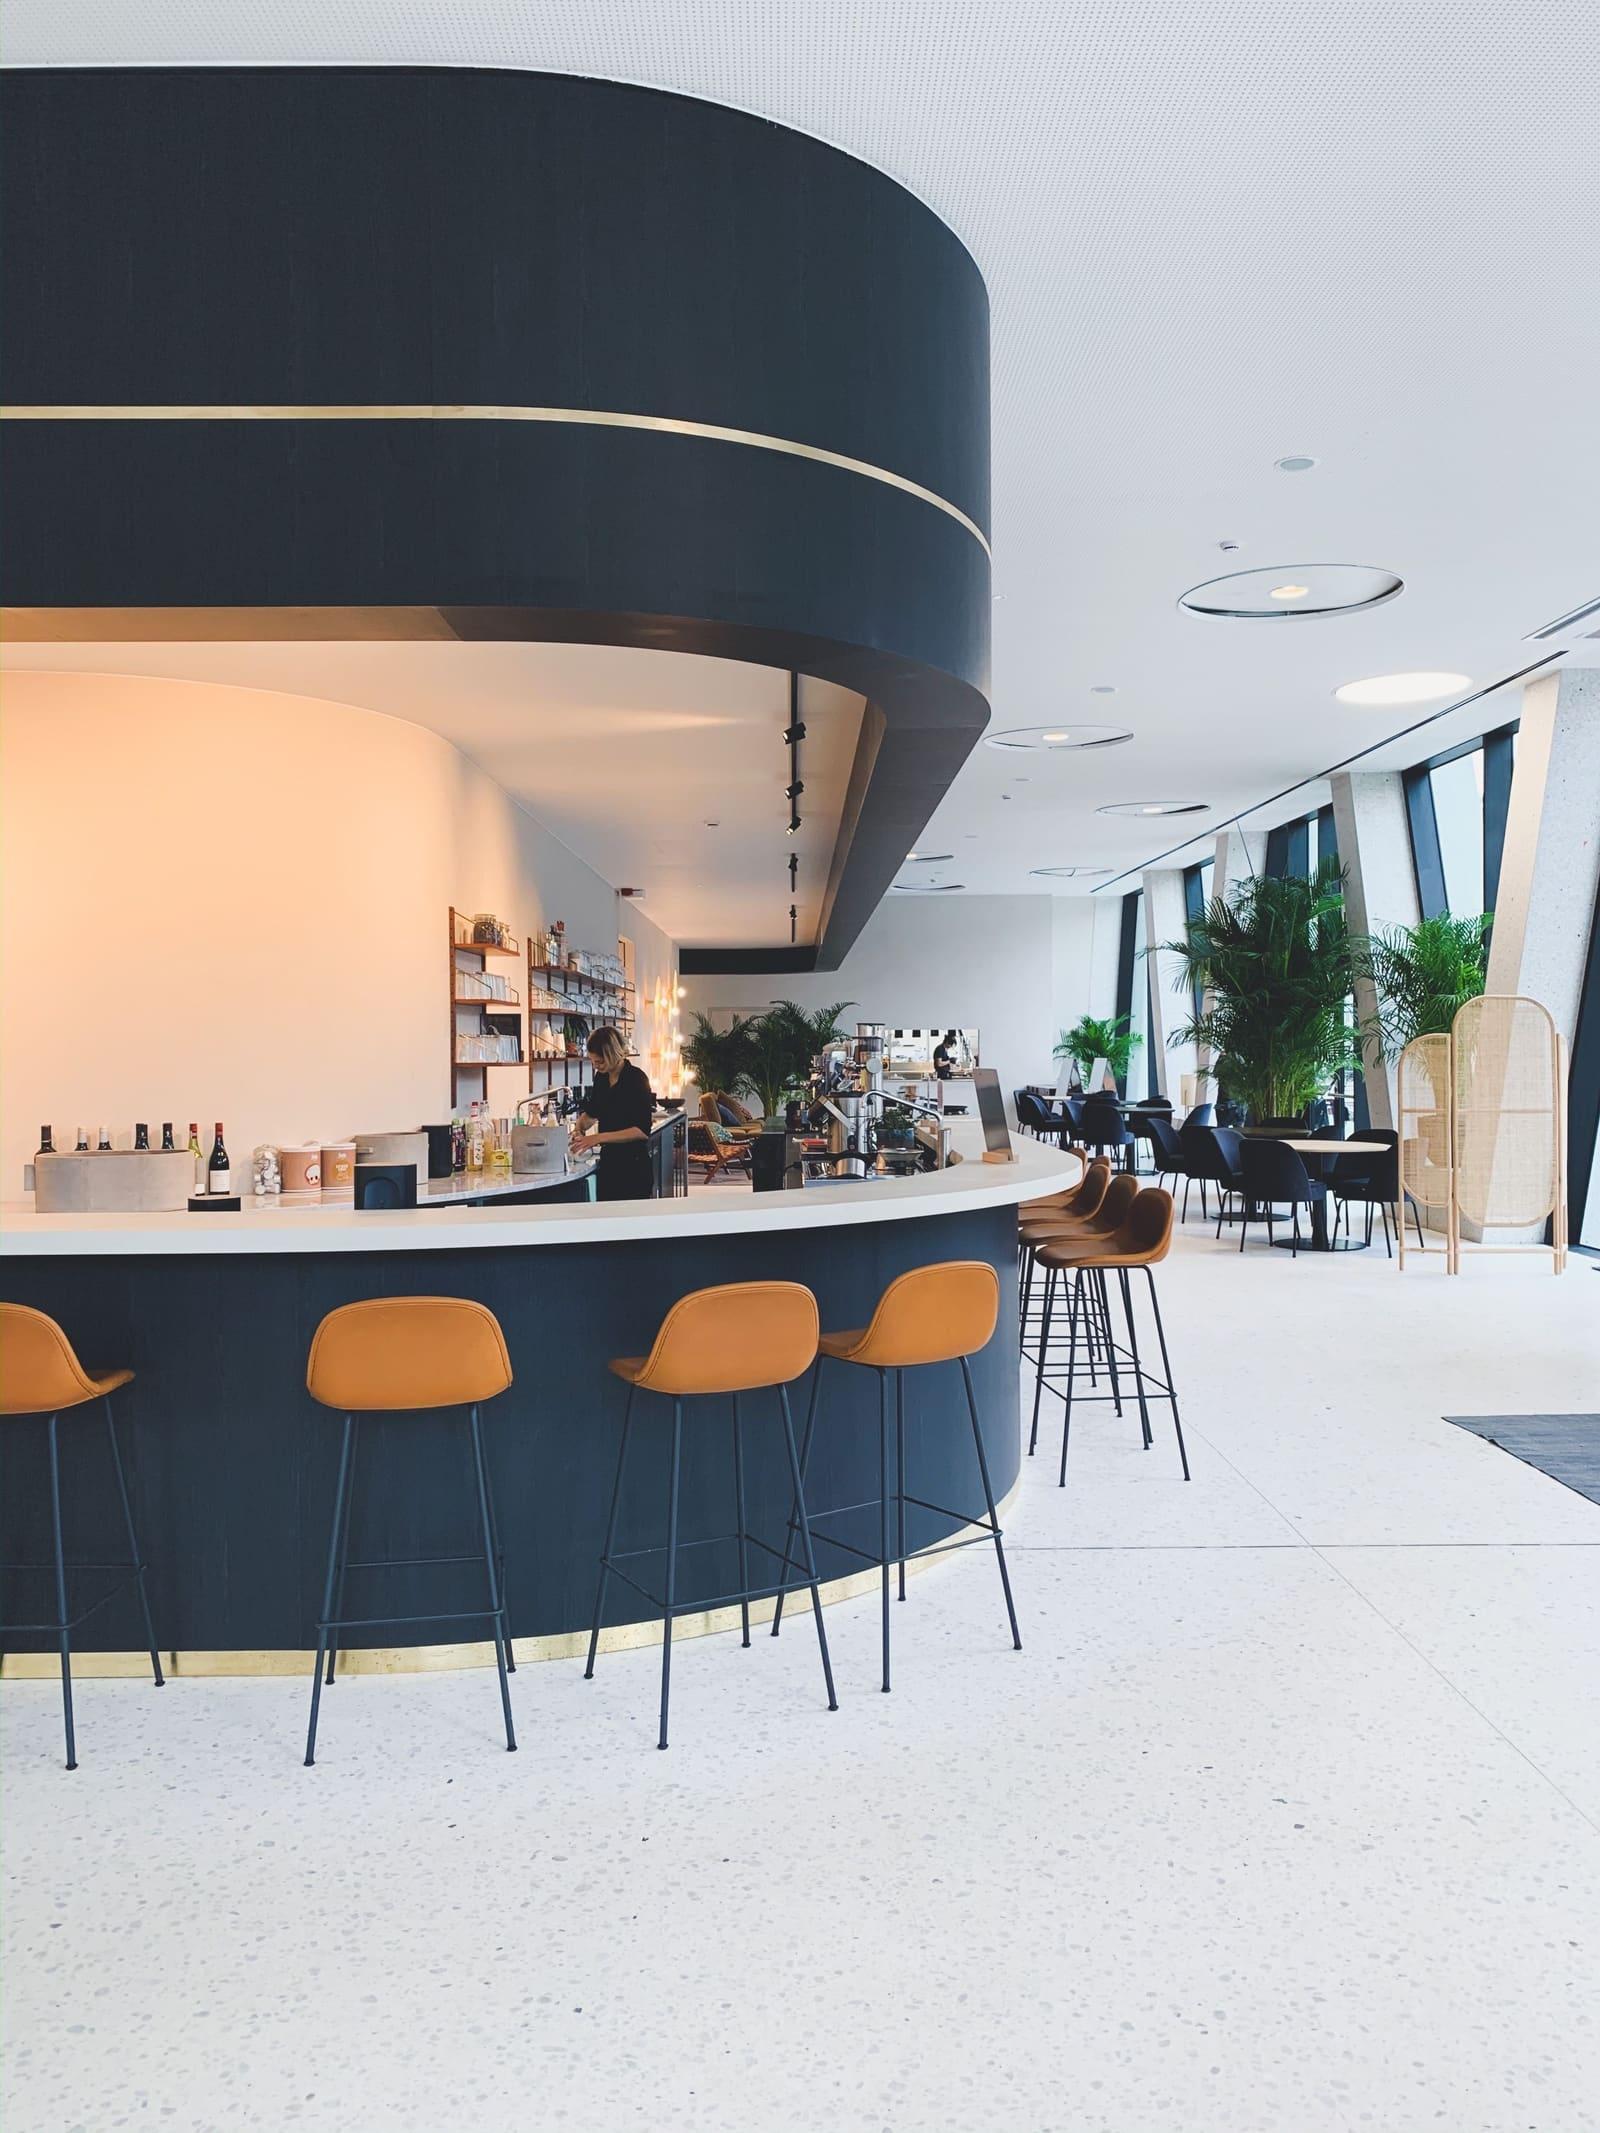 midori hub, a midori lunch location, in DPG media in Antwerp